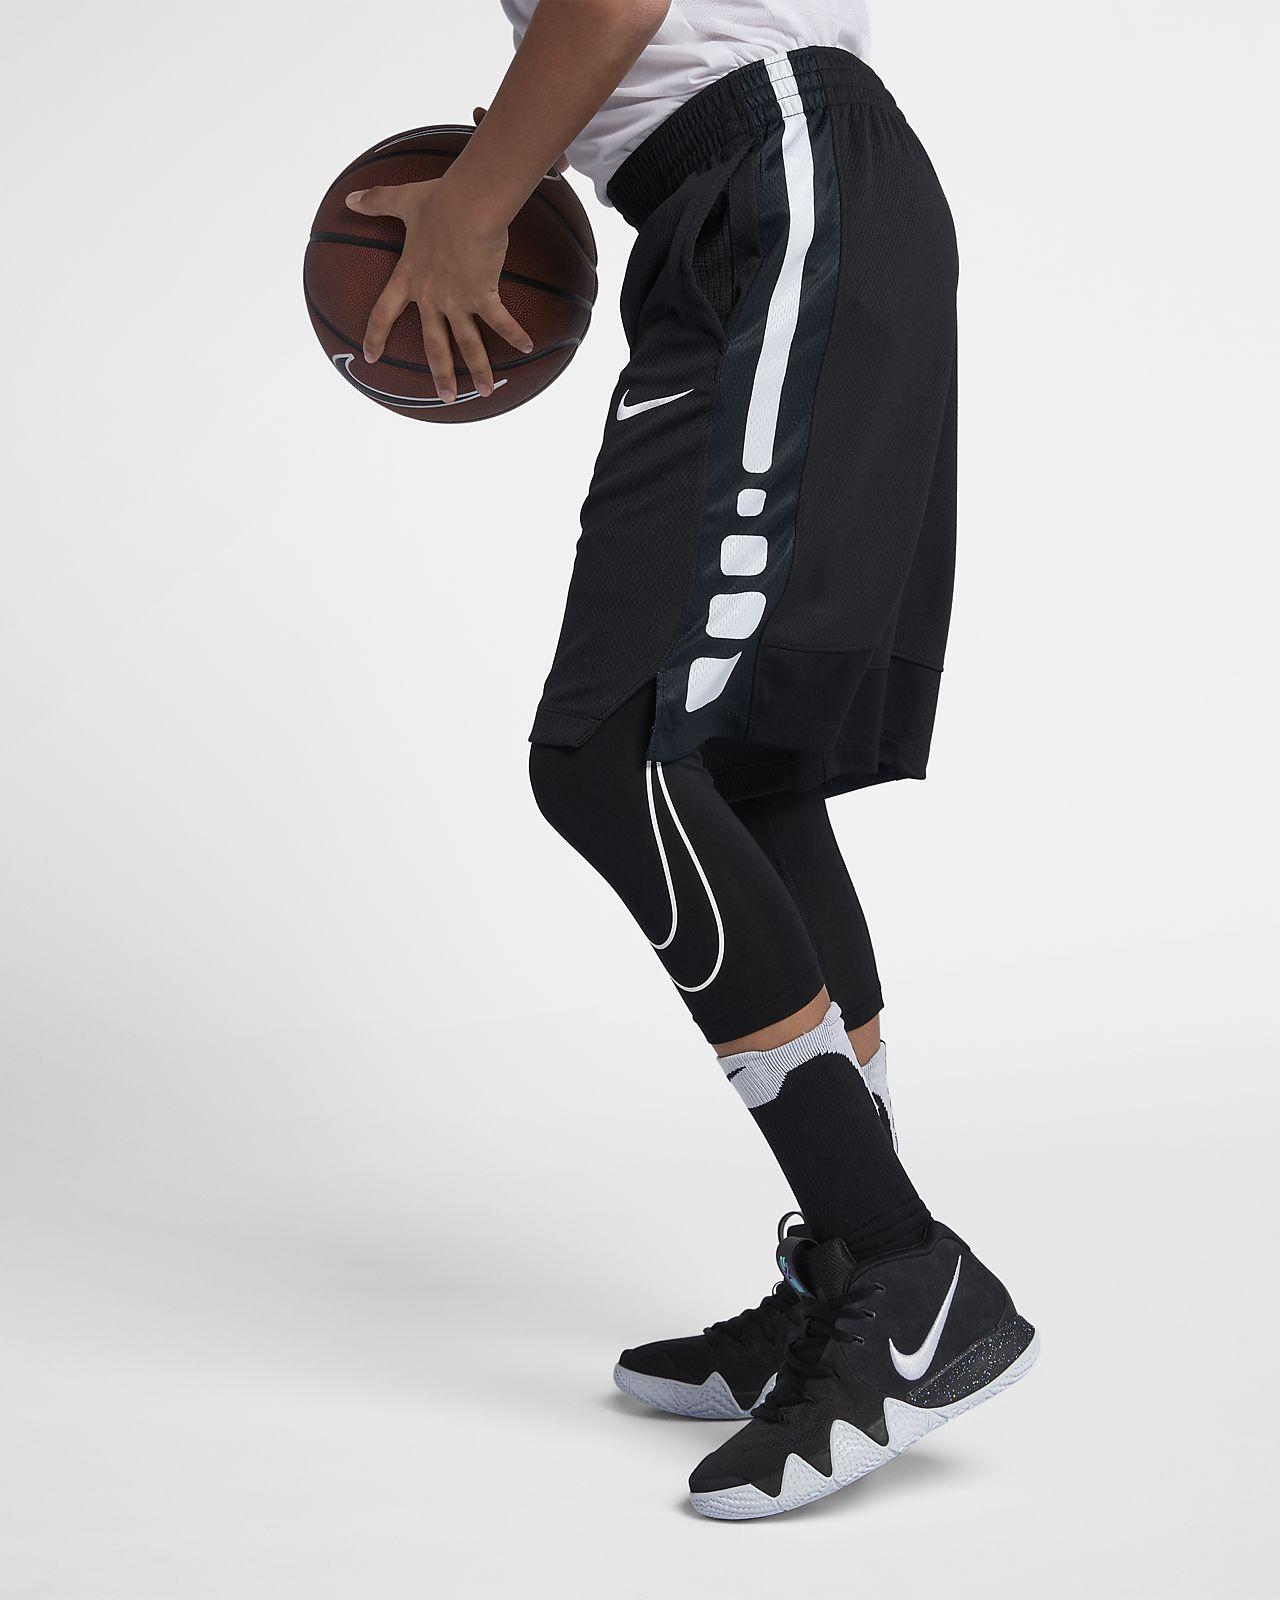 ... Nike Dri-FIT Elite Older Kids' (Boys') Basketball Shorts